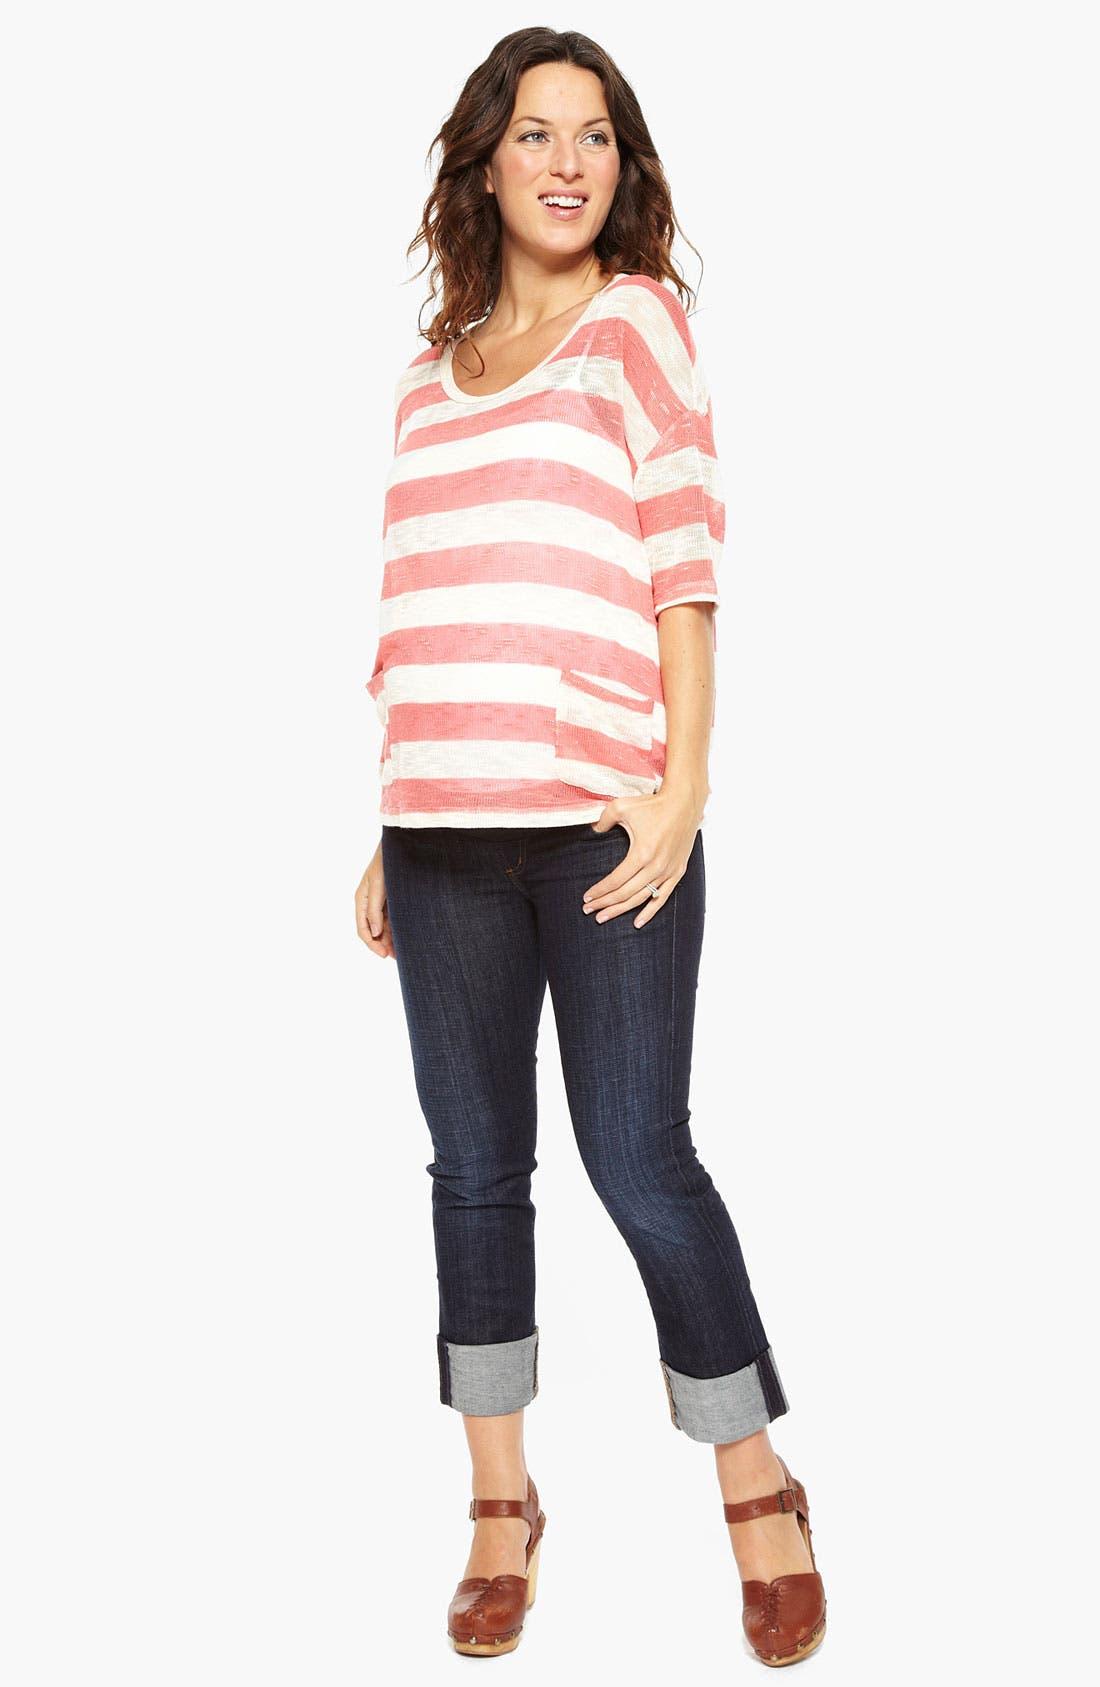 Alternate Image 1 Selected - Nom Maternity 'Hope' Maternity Boyfriend Sweater